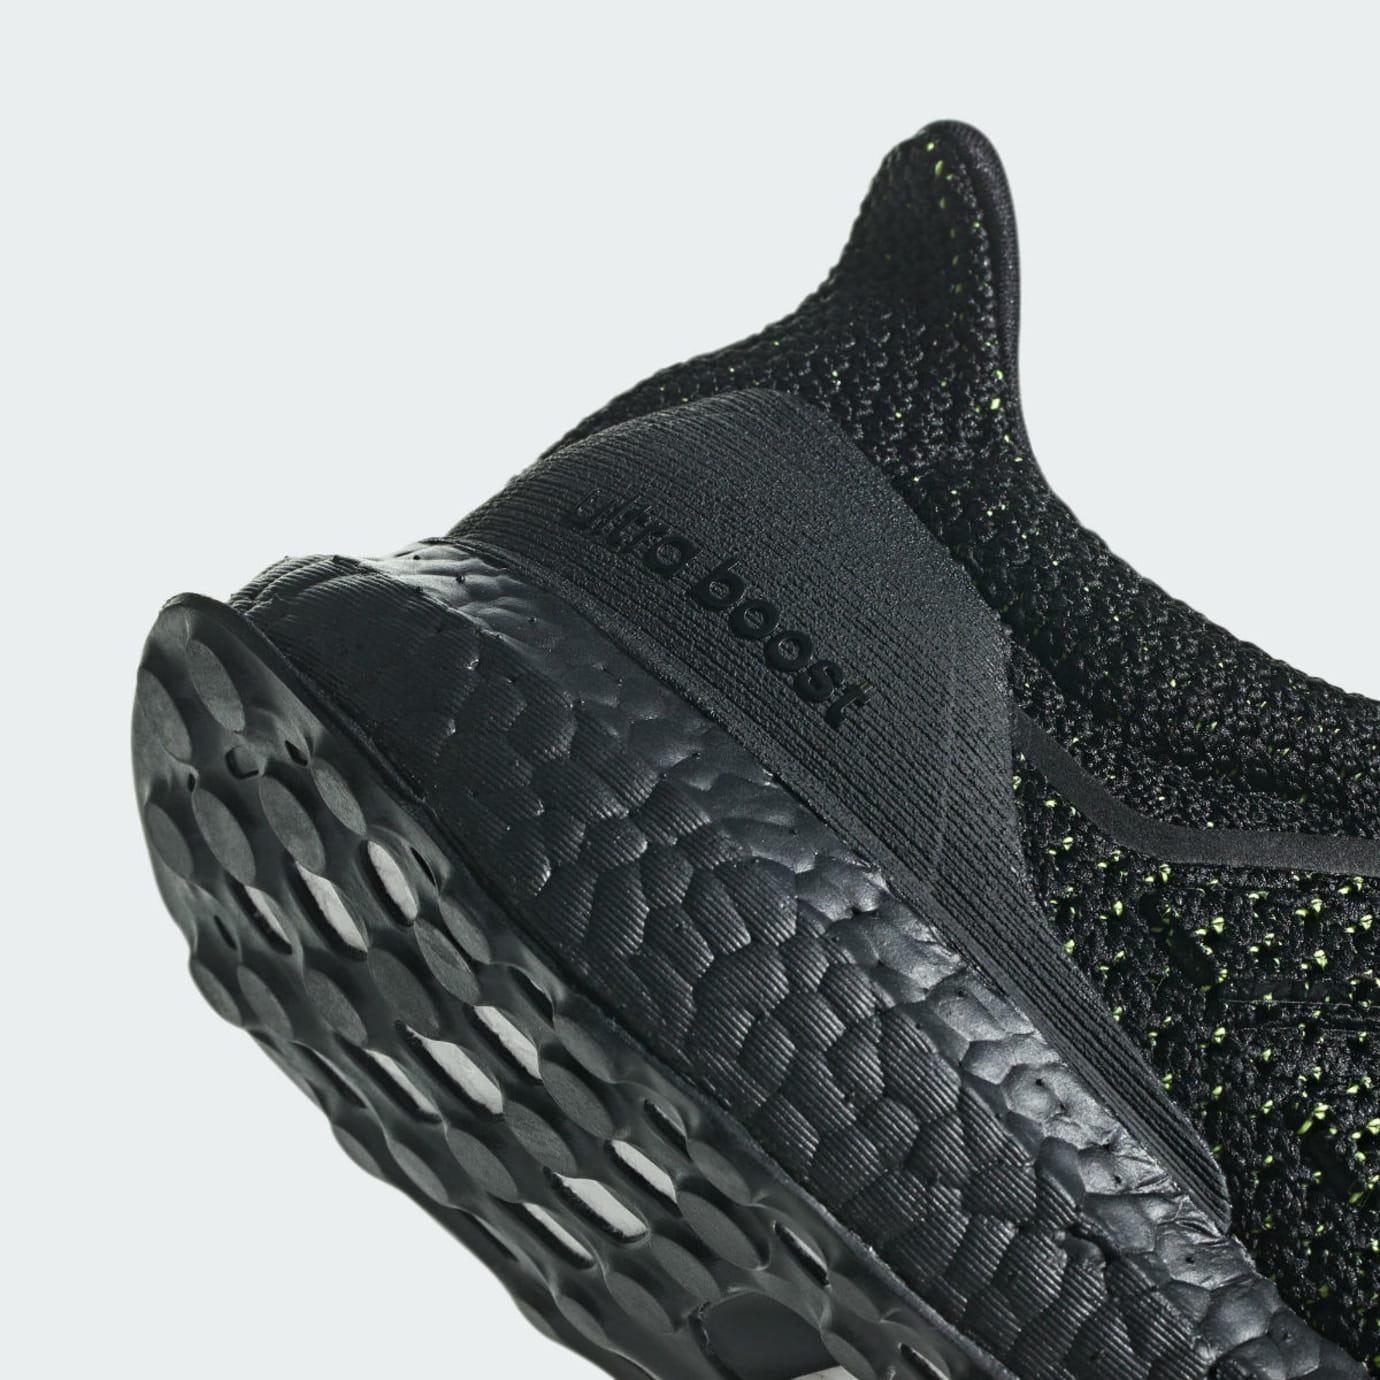 a6f996b80c0 Image via Adidas Adidas Ultra Boost Clima Black Solar Red Release Date  AQ0482 Heel